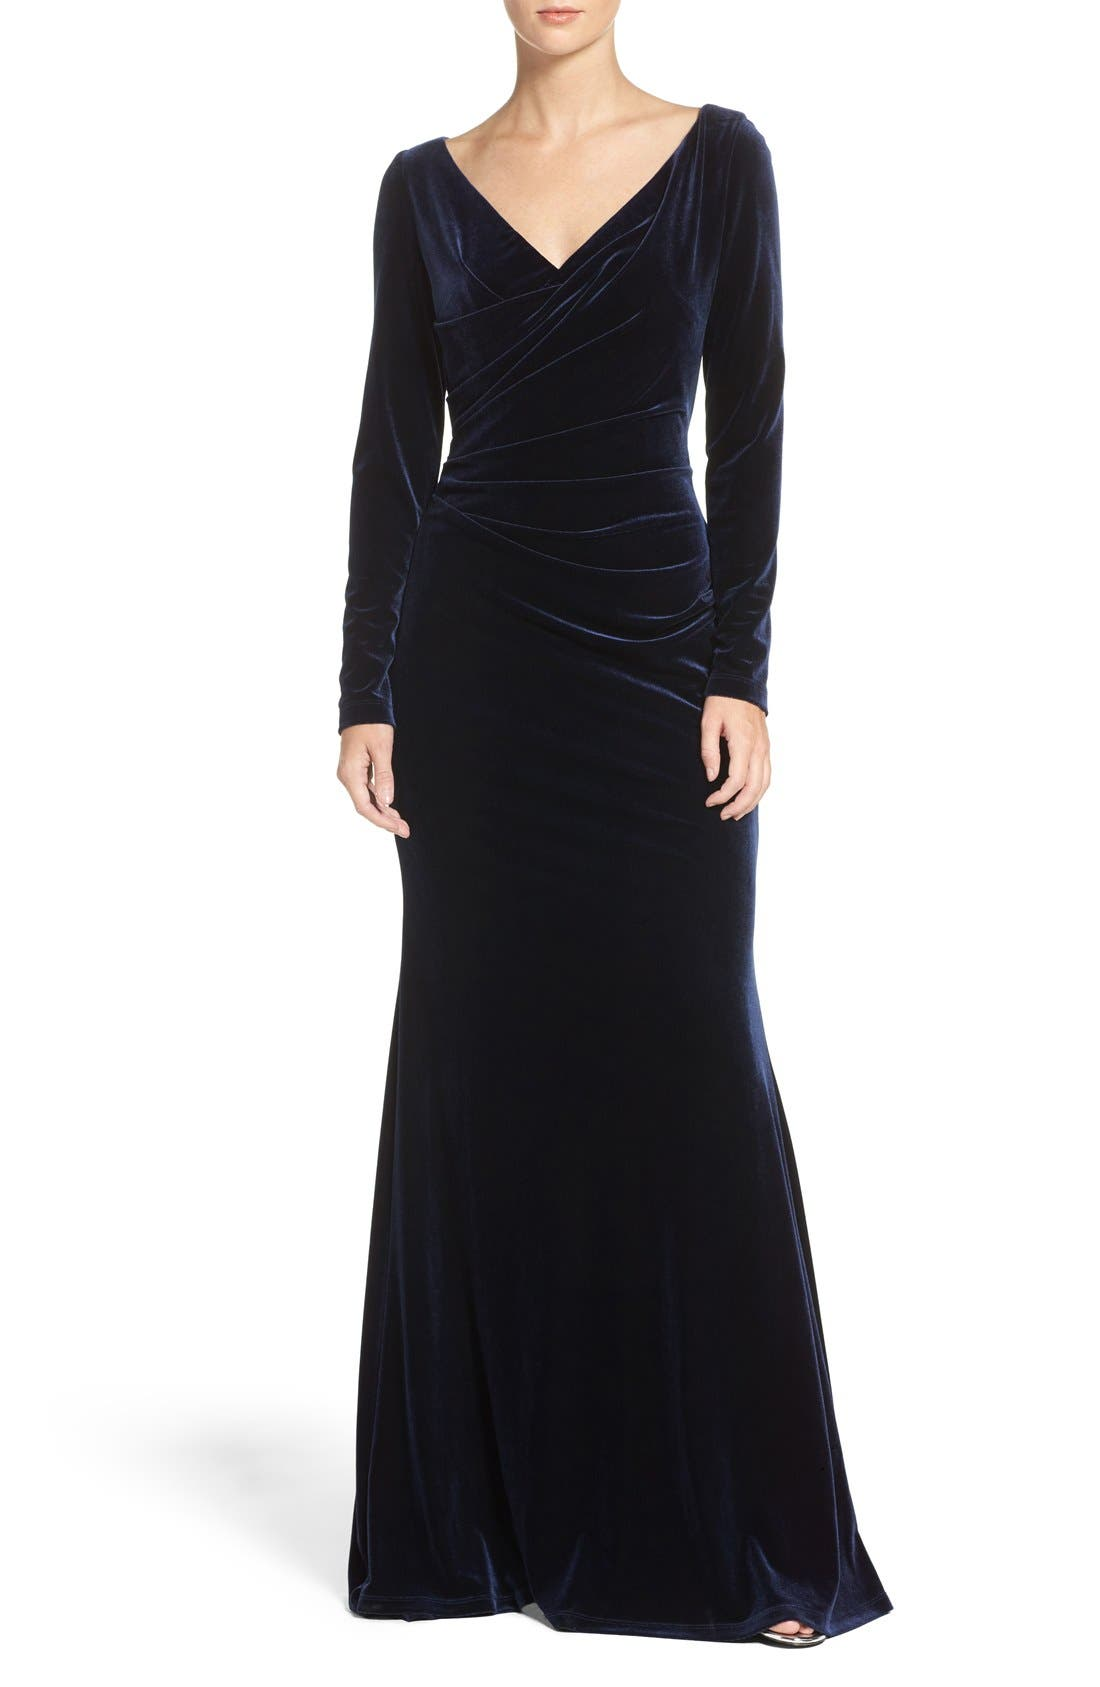 Alternate Image 1 Selected - Vince Camuto Velvet Gown (Regular & Petite)